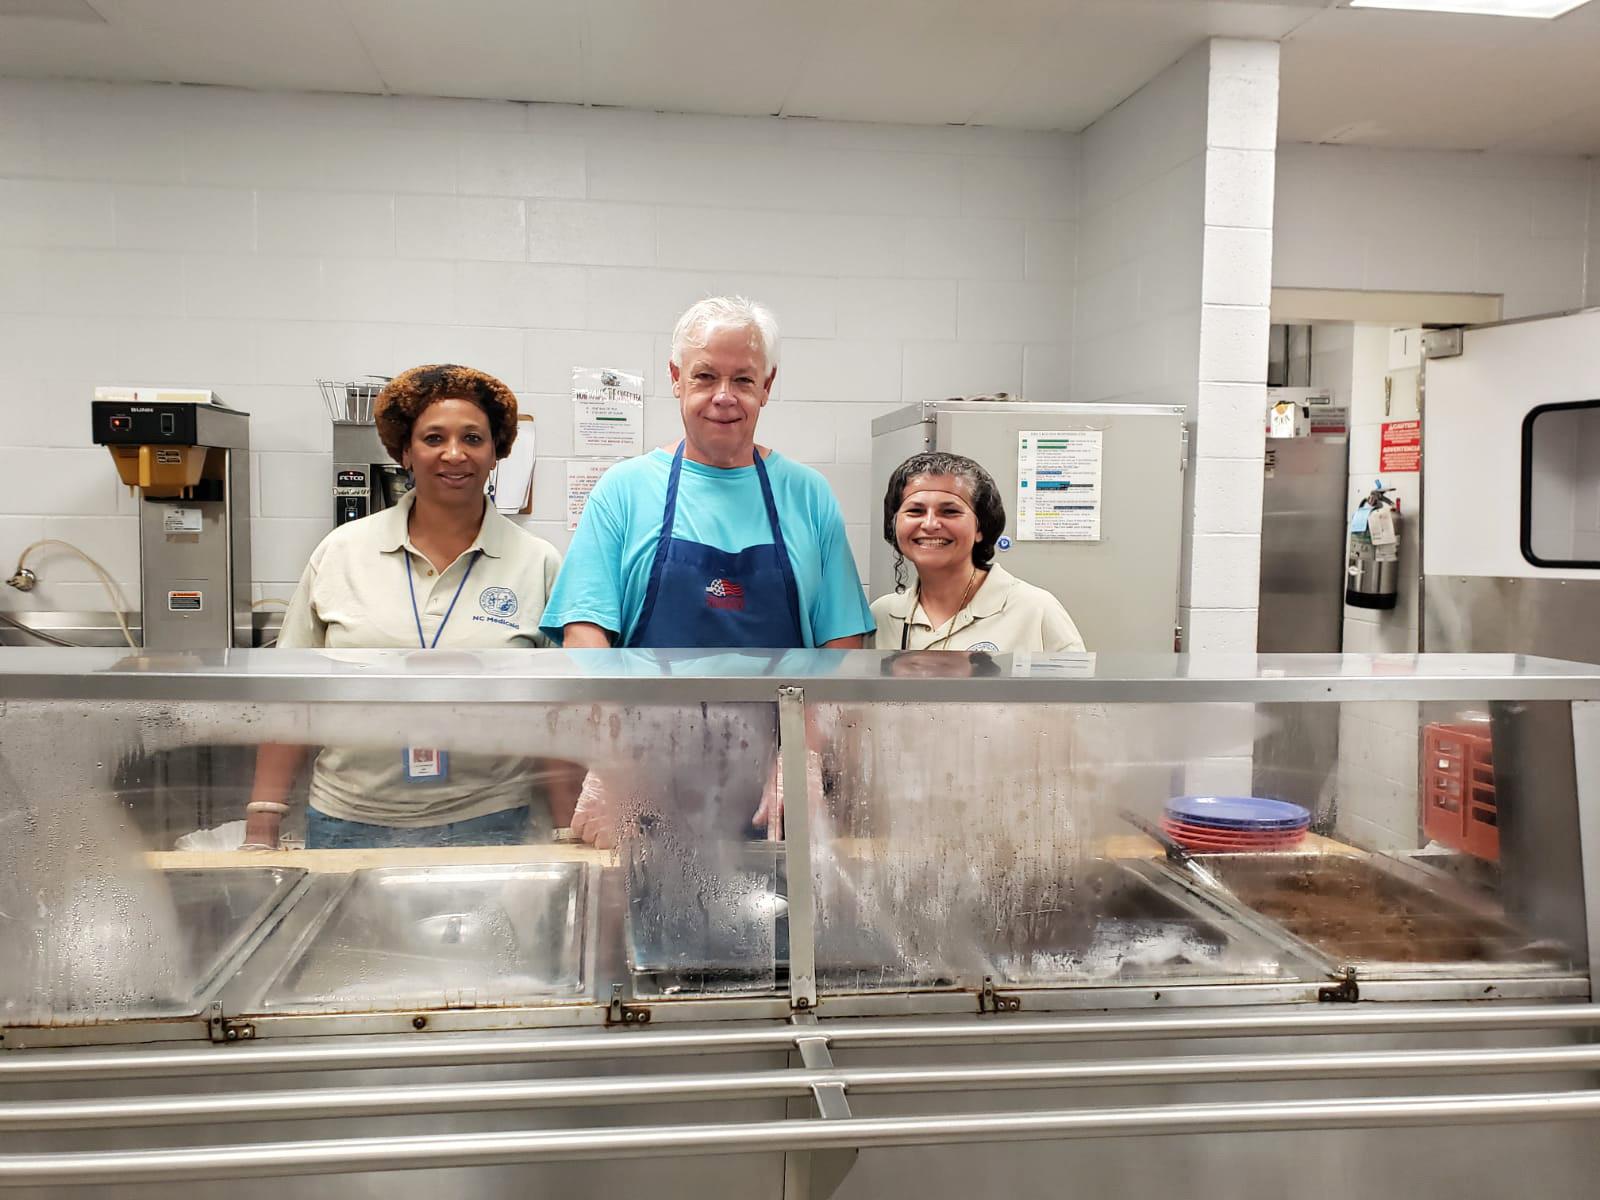 NC Medicaid employees serving food at Healing Transitions.